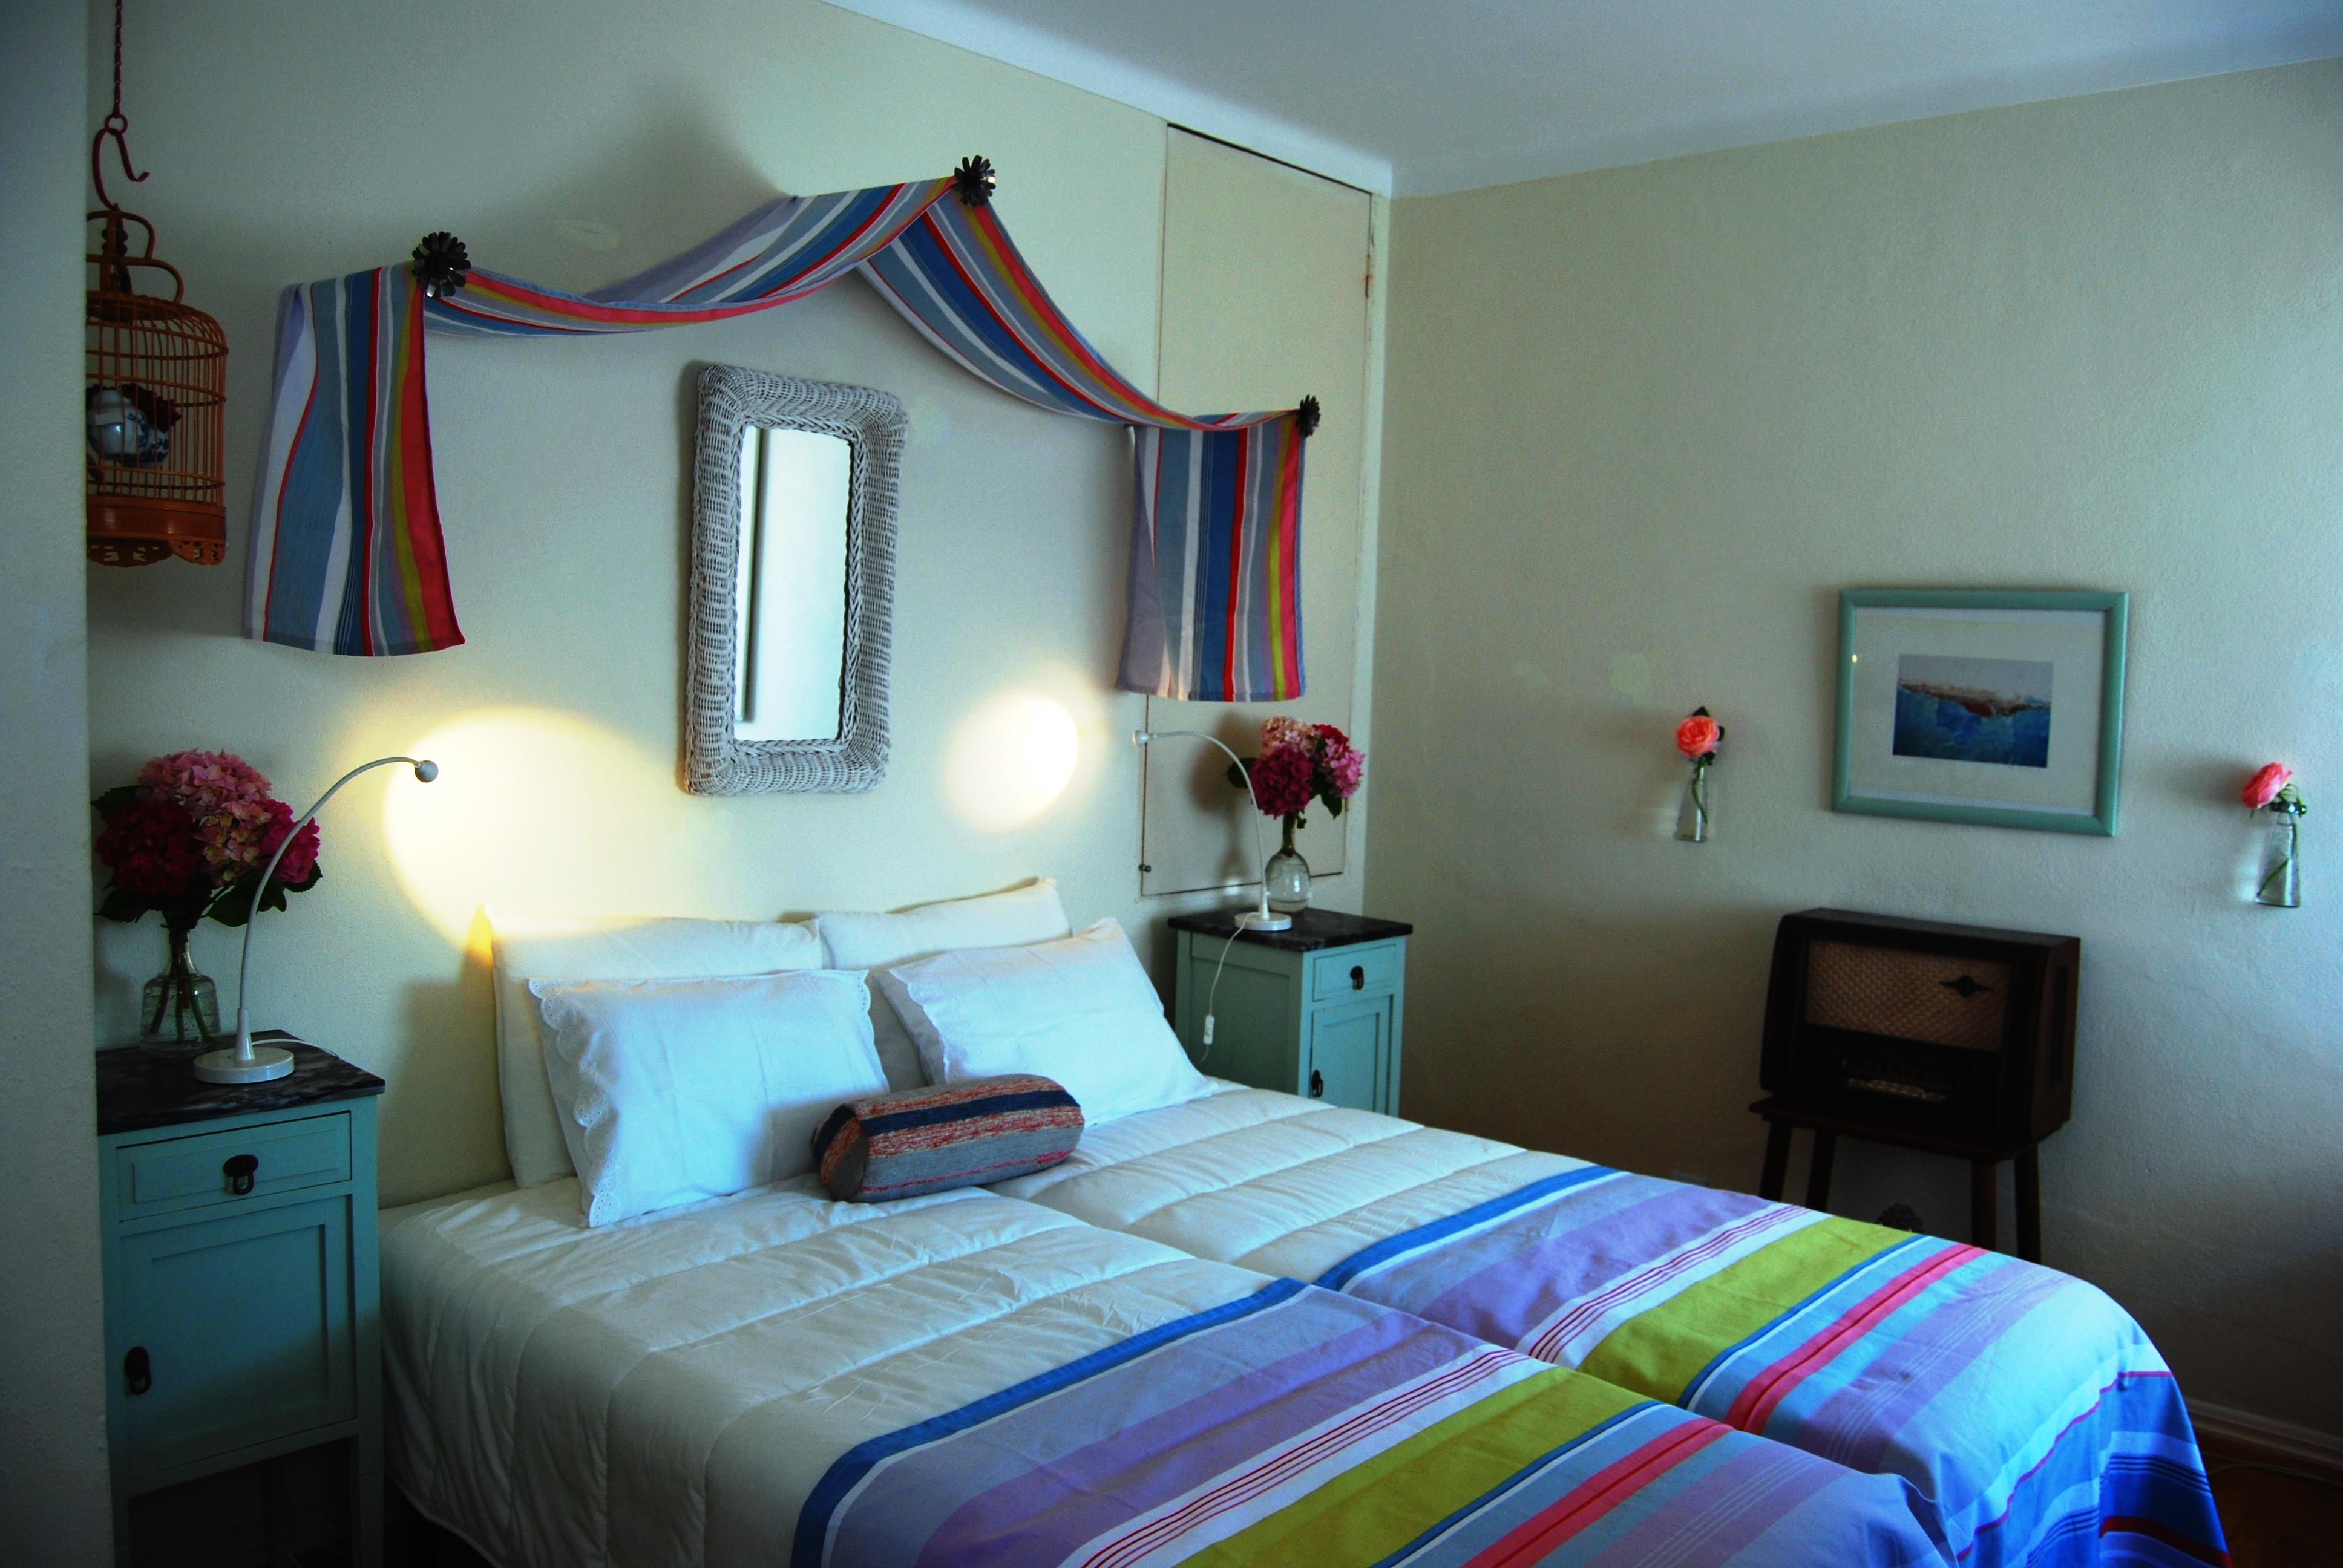 Holiday house Casa Maria d'Obidos - Ferienhaus - 3 Schlafzimmer, 2 Badezimmer, 6 (2599548), Óbidos, Costa de Prata, Central-Portugal, Portugal, picture 20